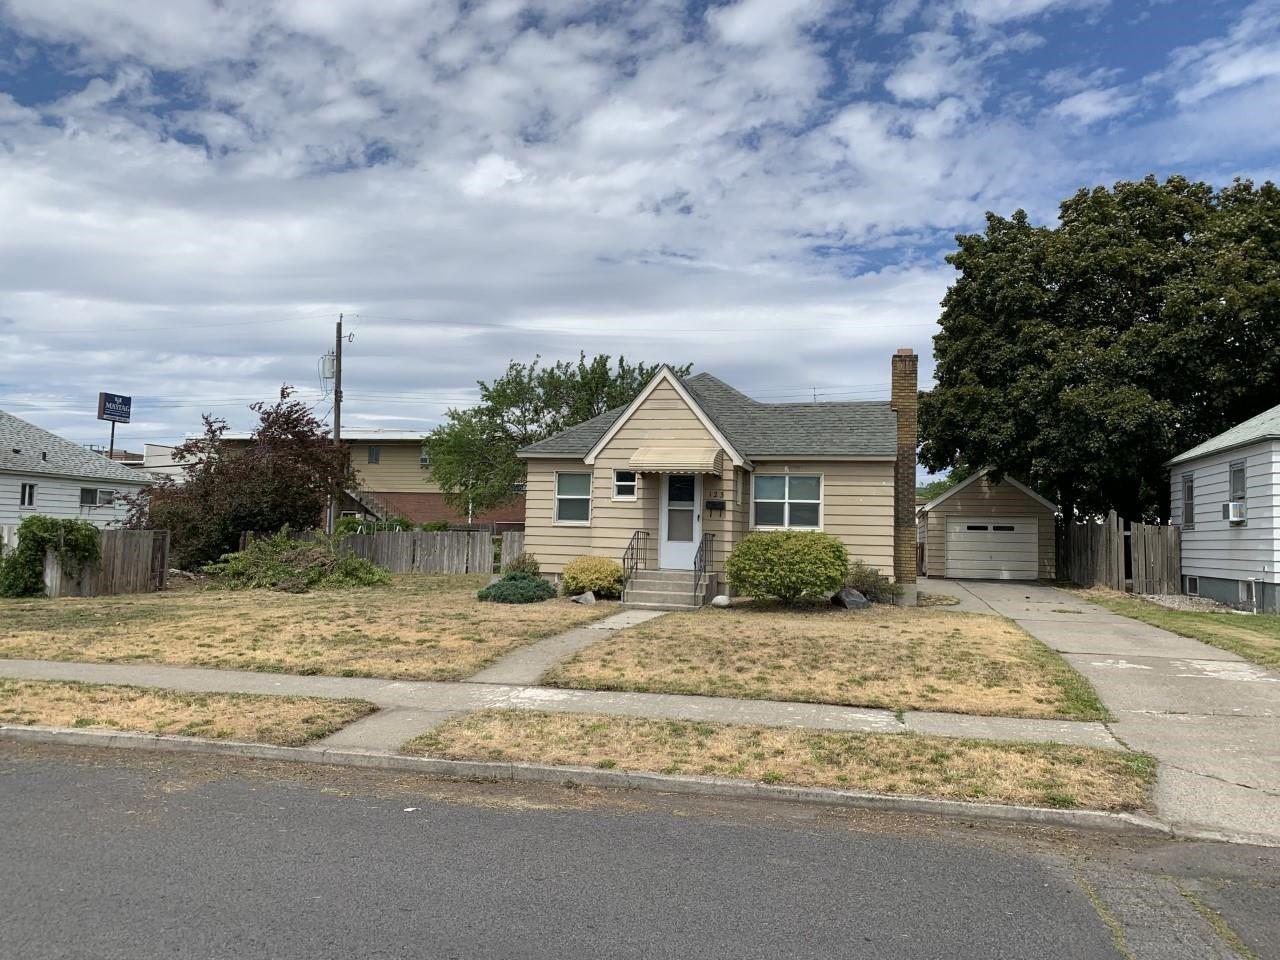 123 E Hoffman Ave, Spokane, WA 99207 - #: 202118587